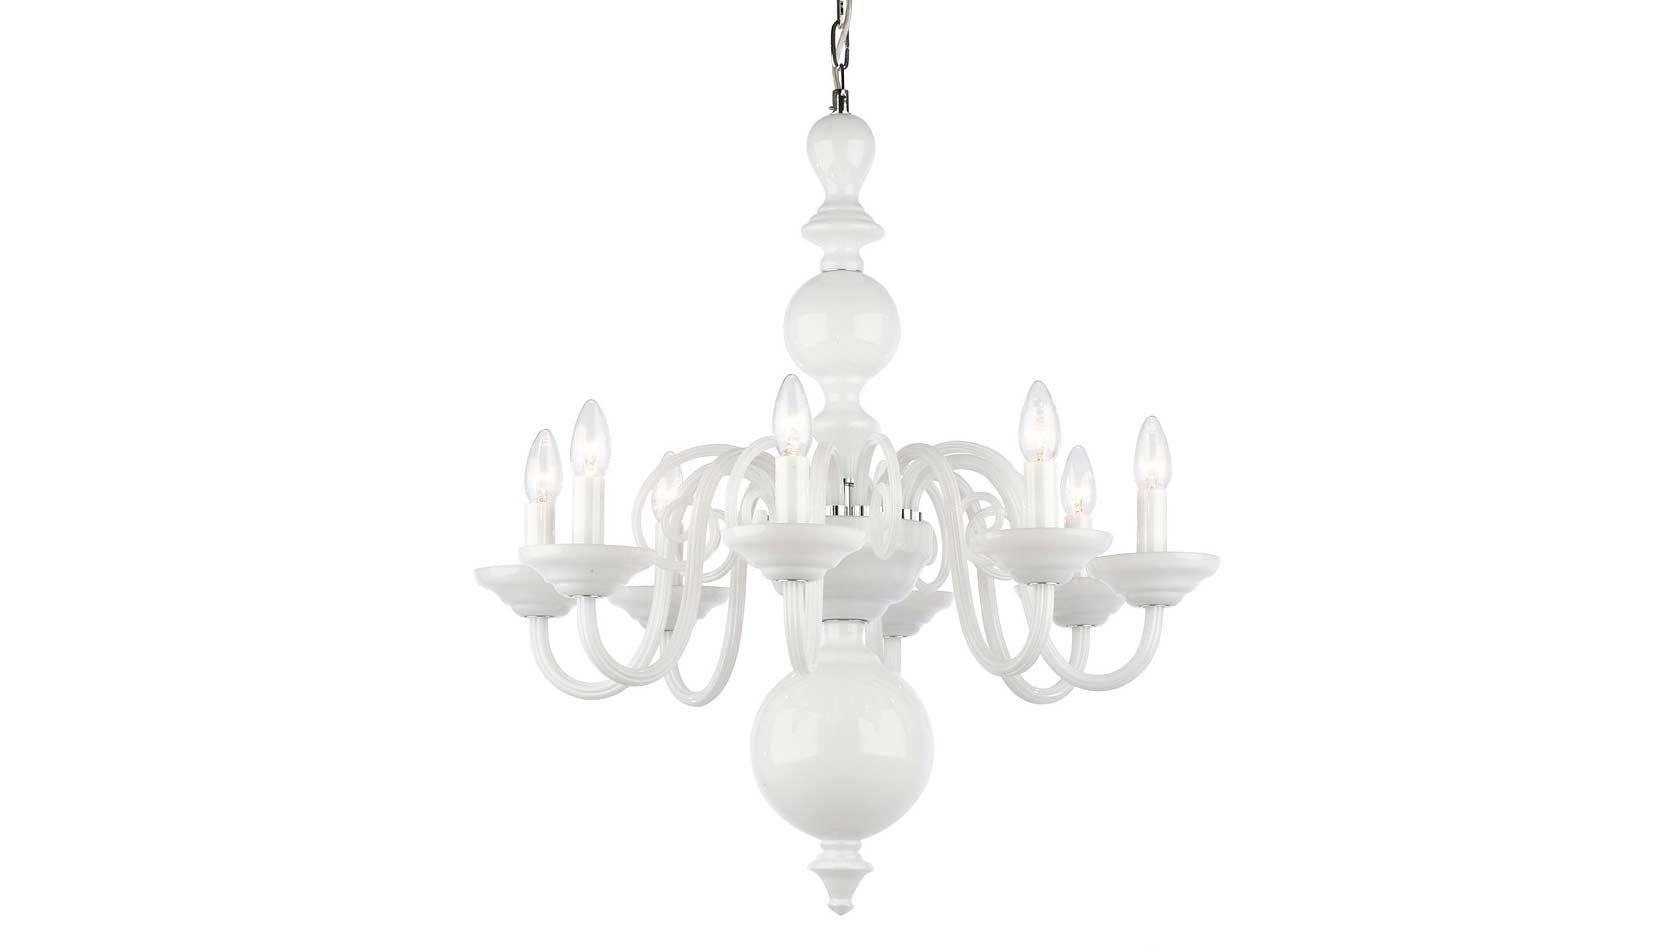 Tulip 8 arm crystal chandelier originated in old bohemia and now tulip 8 arm crystal chandelier originated in old bohemia and now continued in arubaitofo Gallery